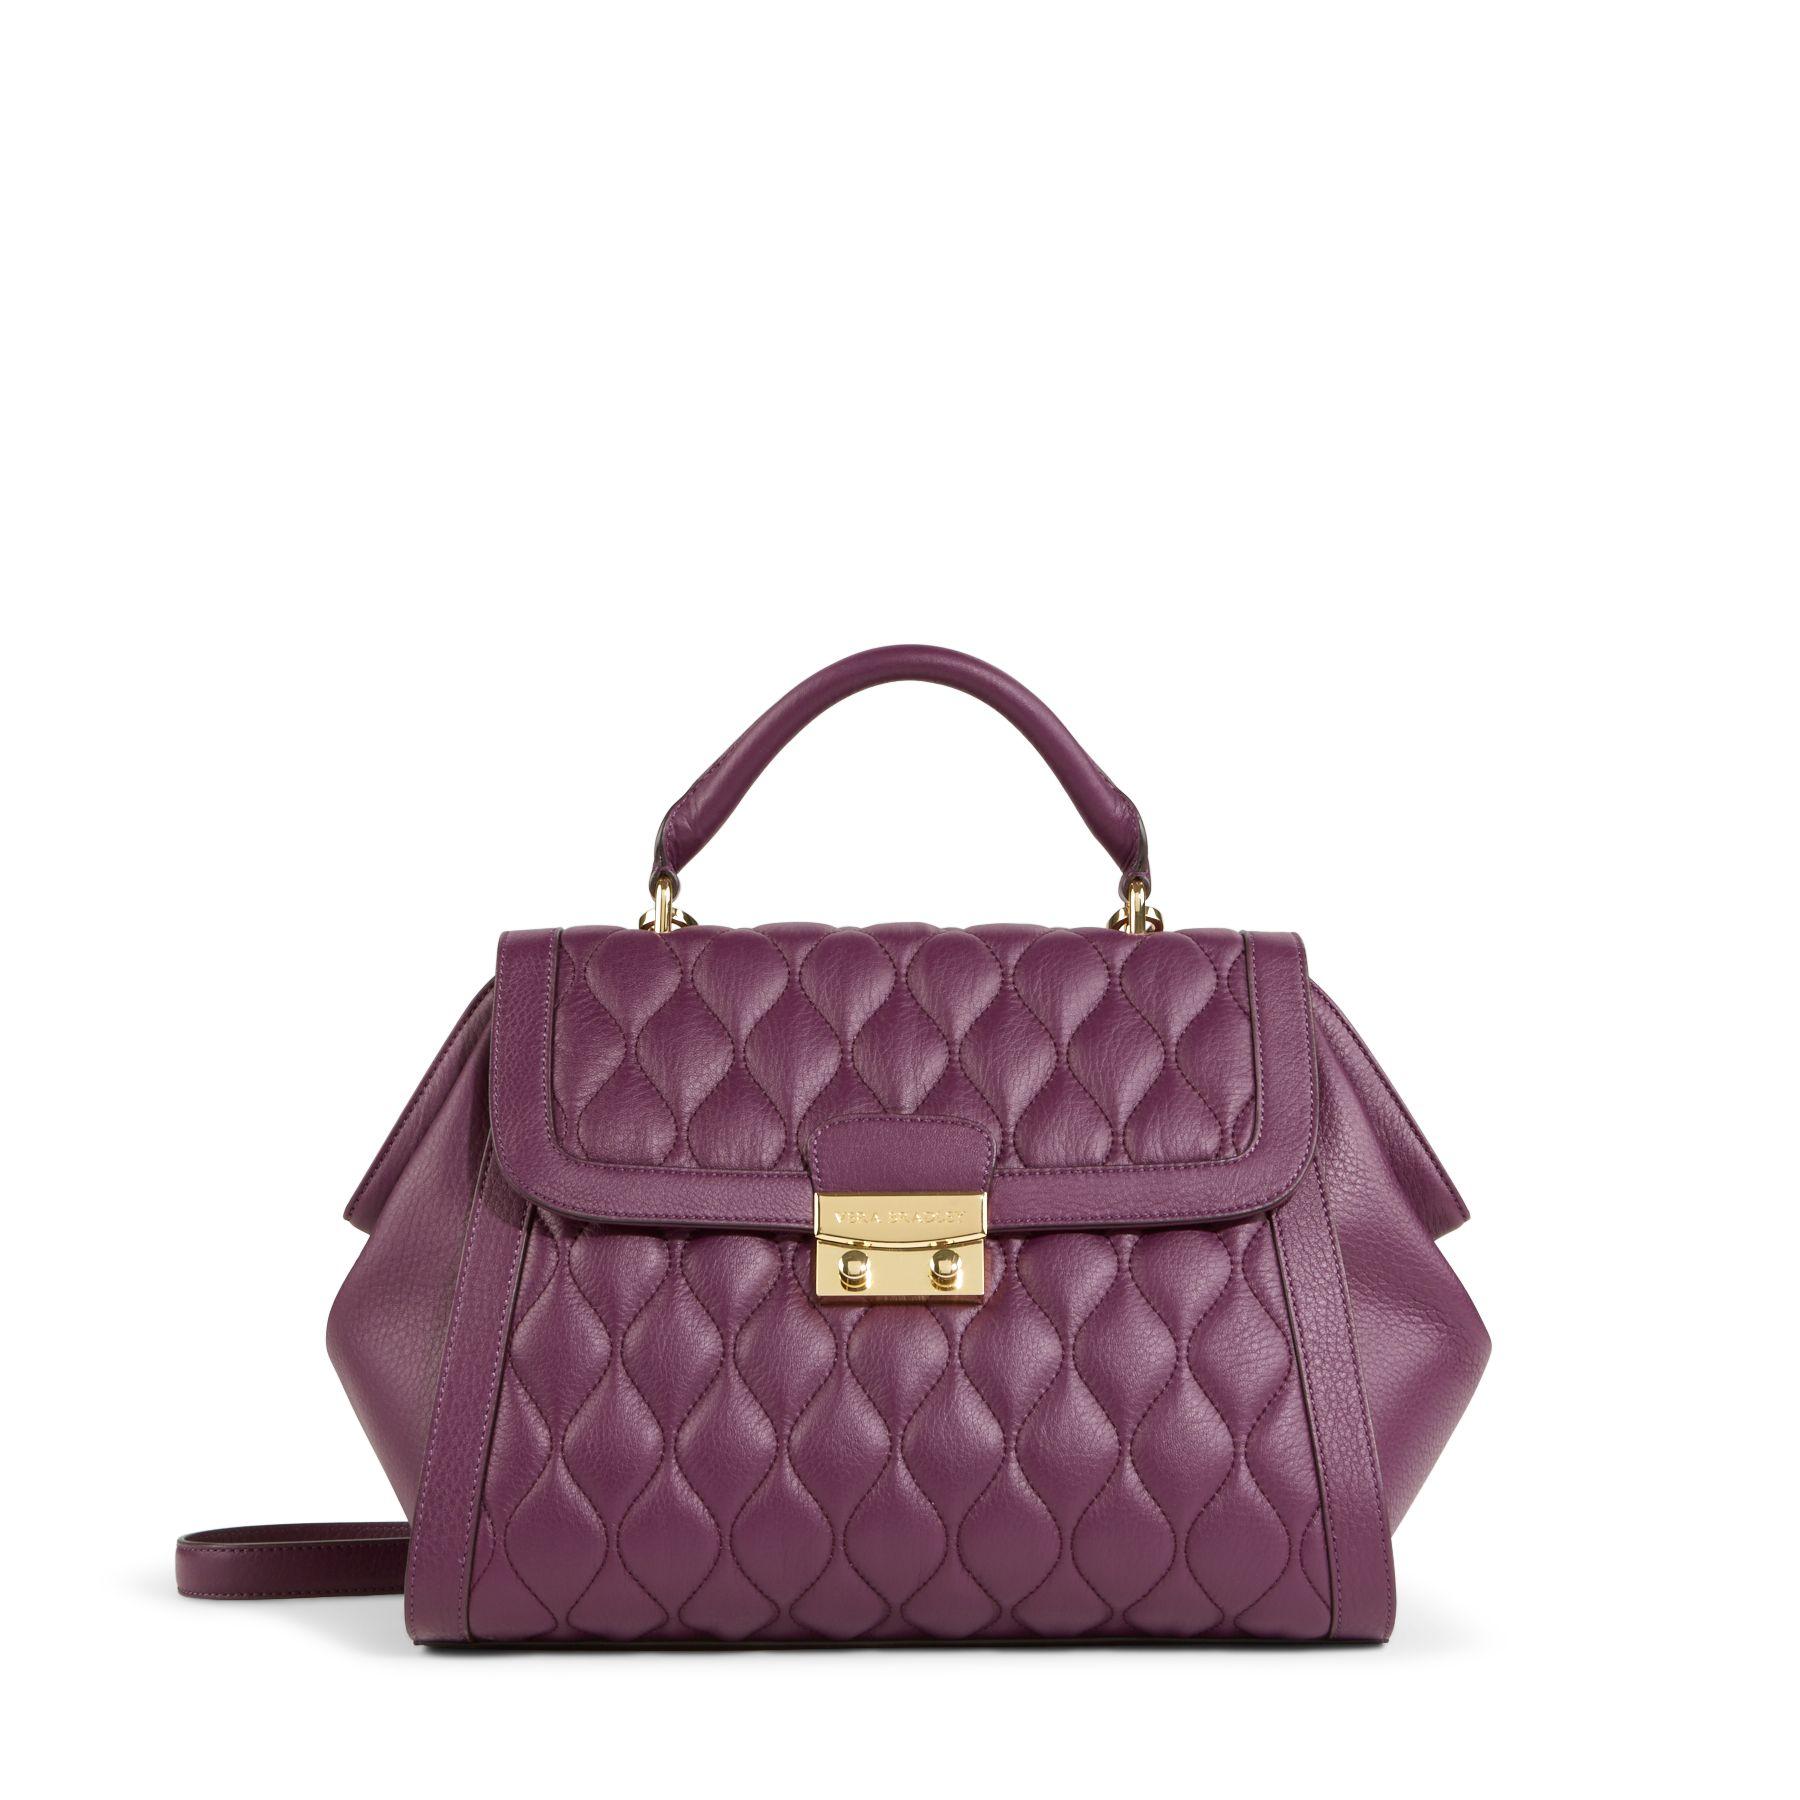 Vera Bradley Quilted Leather Stella Satchel Bag